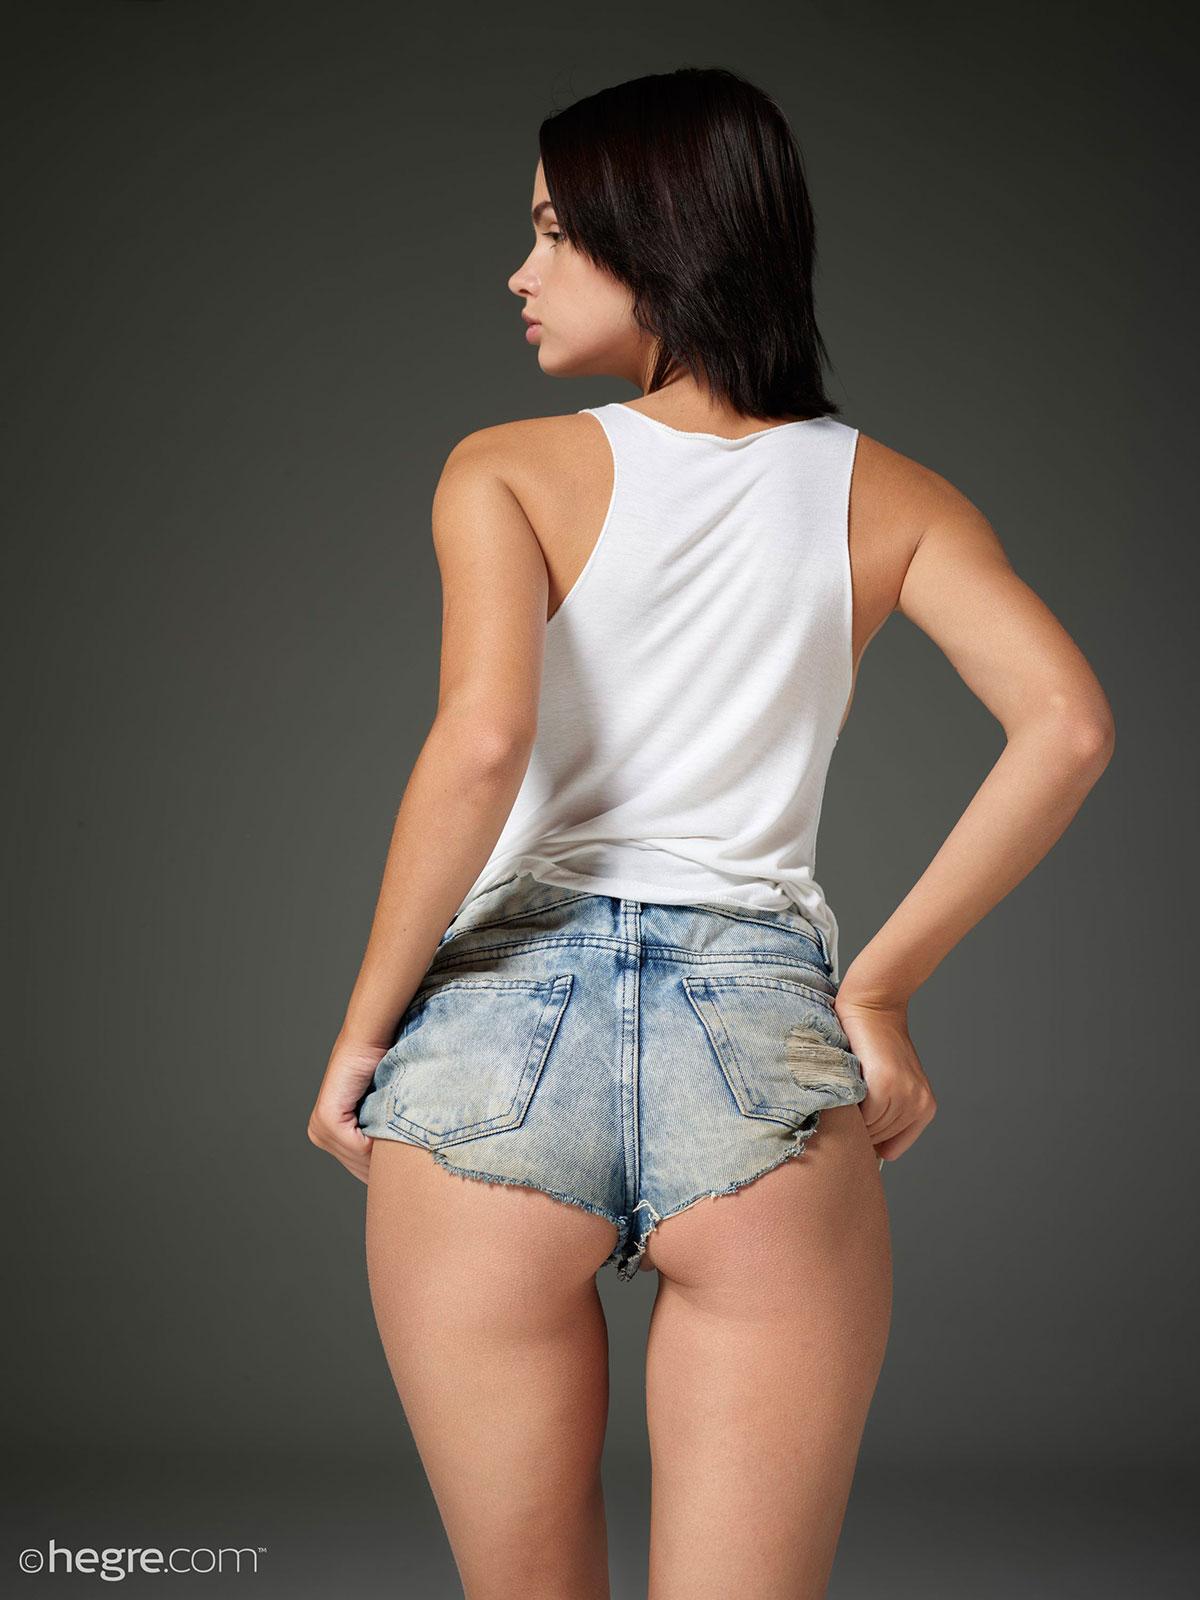 Katarina kaif sexy photos